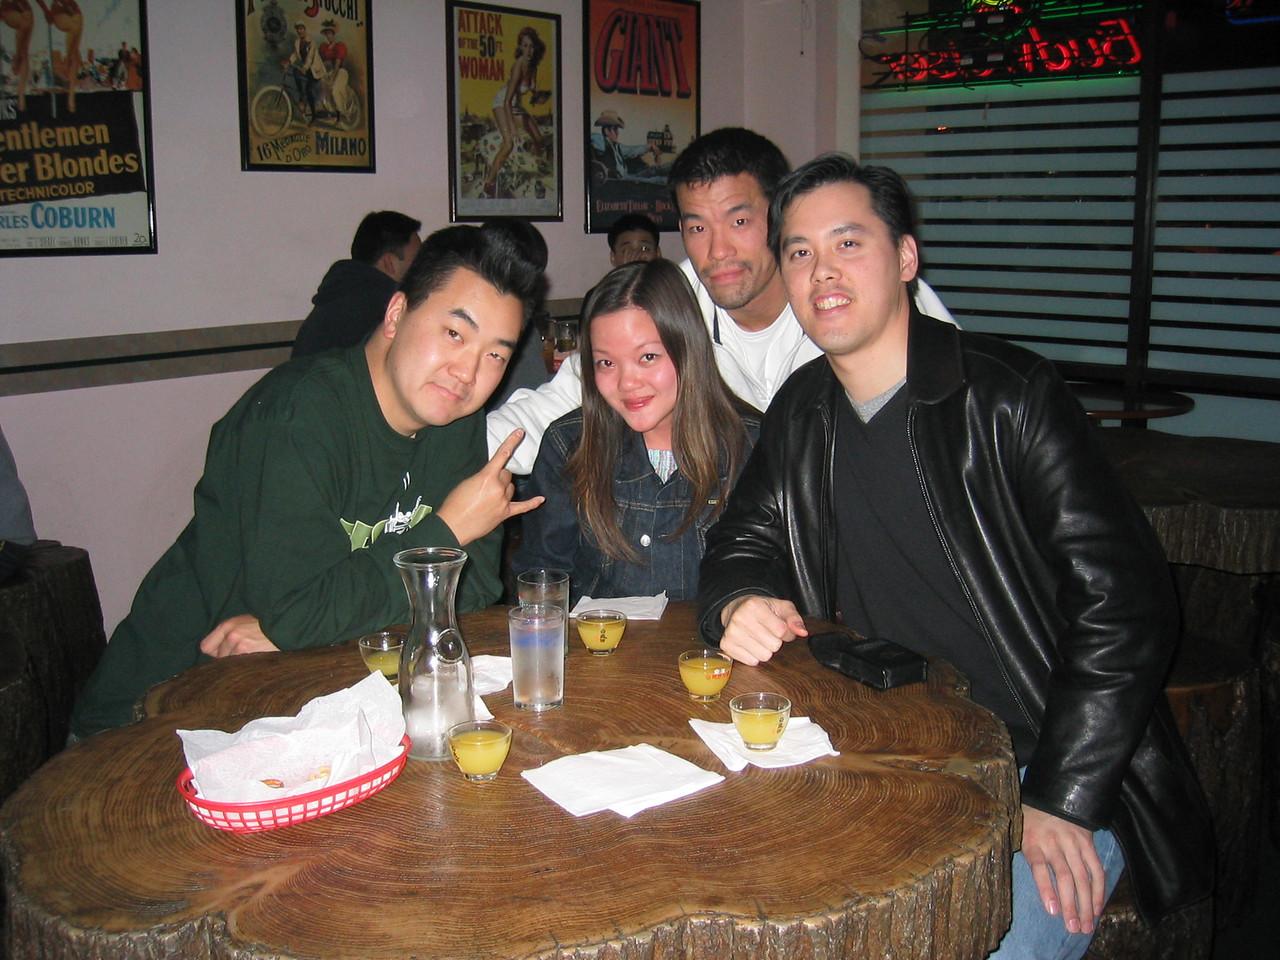 2004 12 18 Saturday - Soju'ed Pink Joann & the boys, Stanley, Alex, & Benny